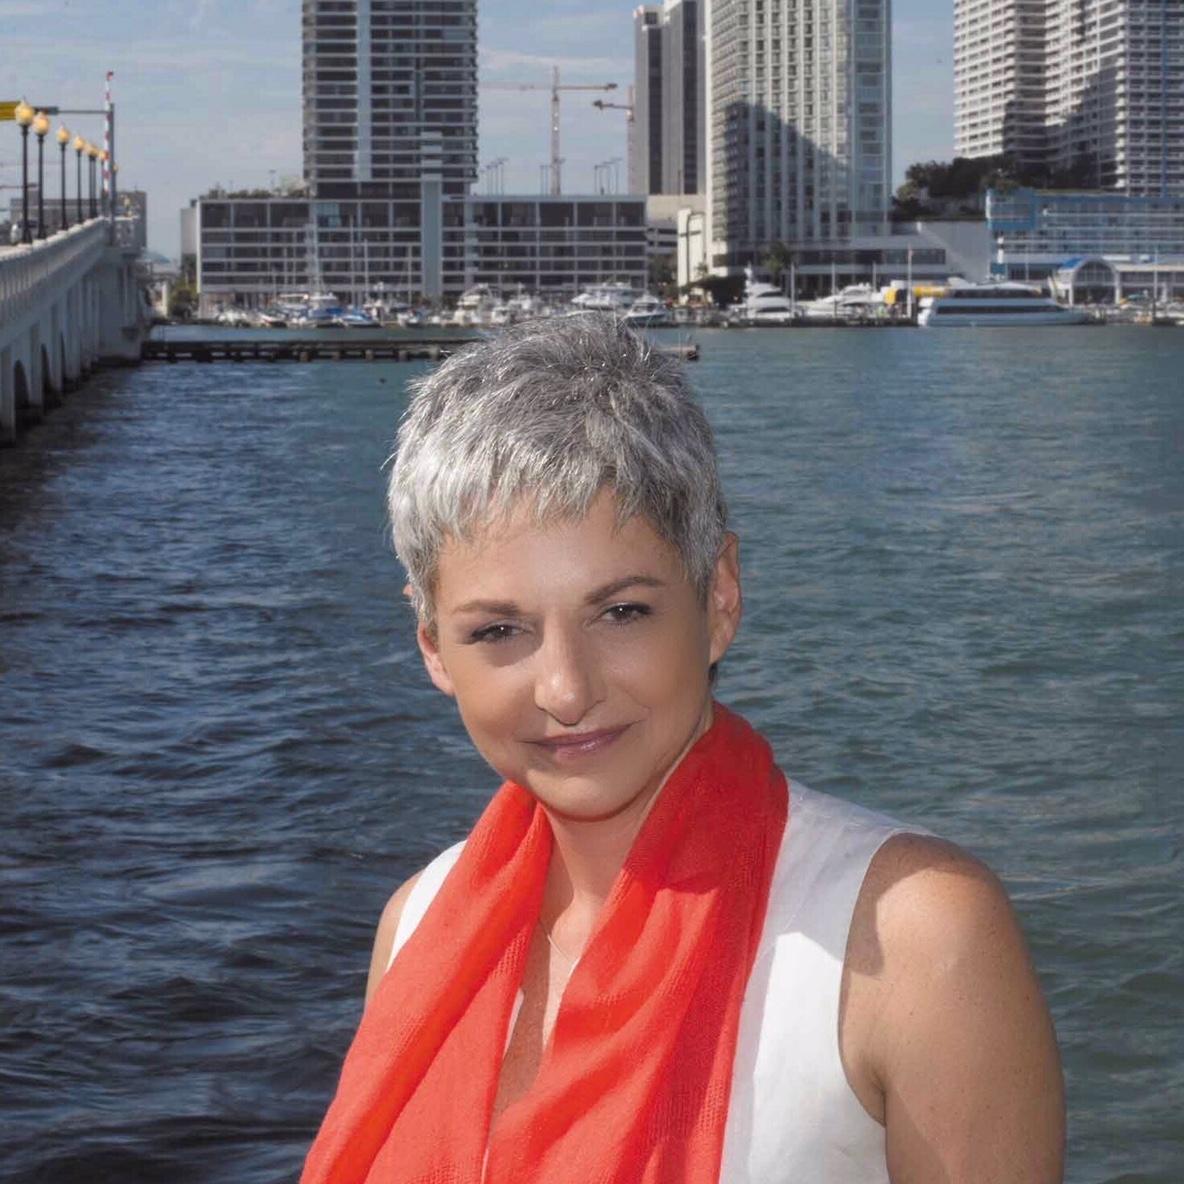 Irene Hegedus - Irene Hegedus.JPG